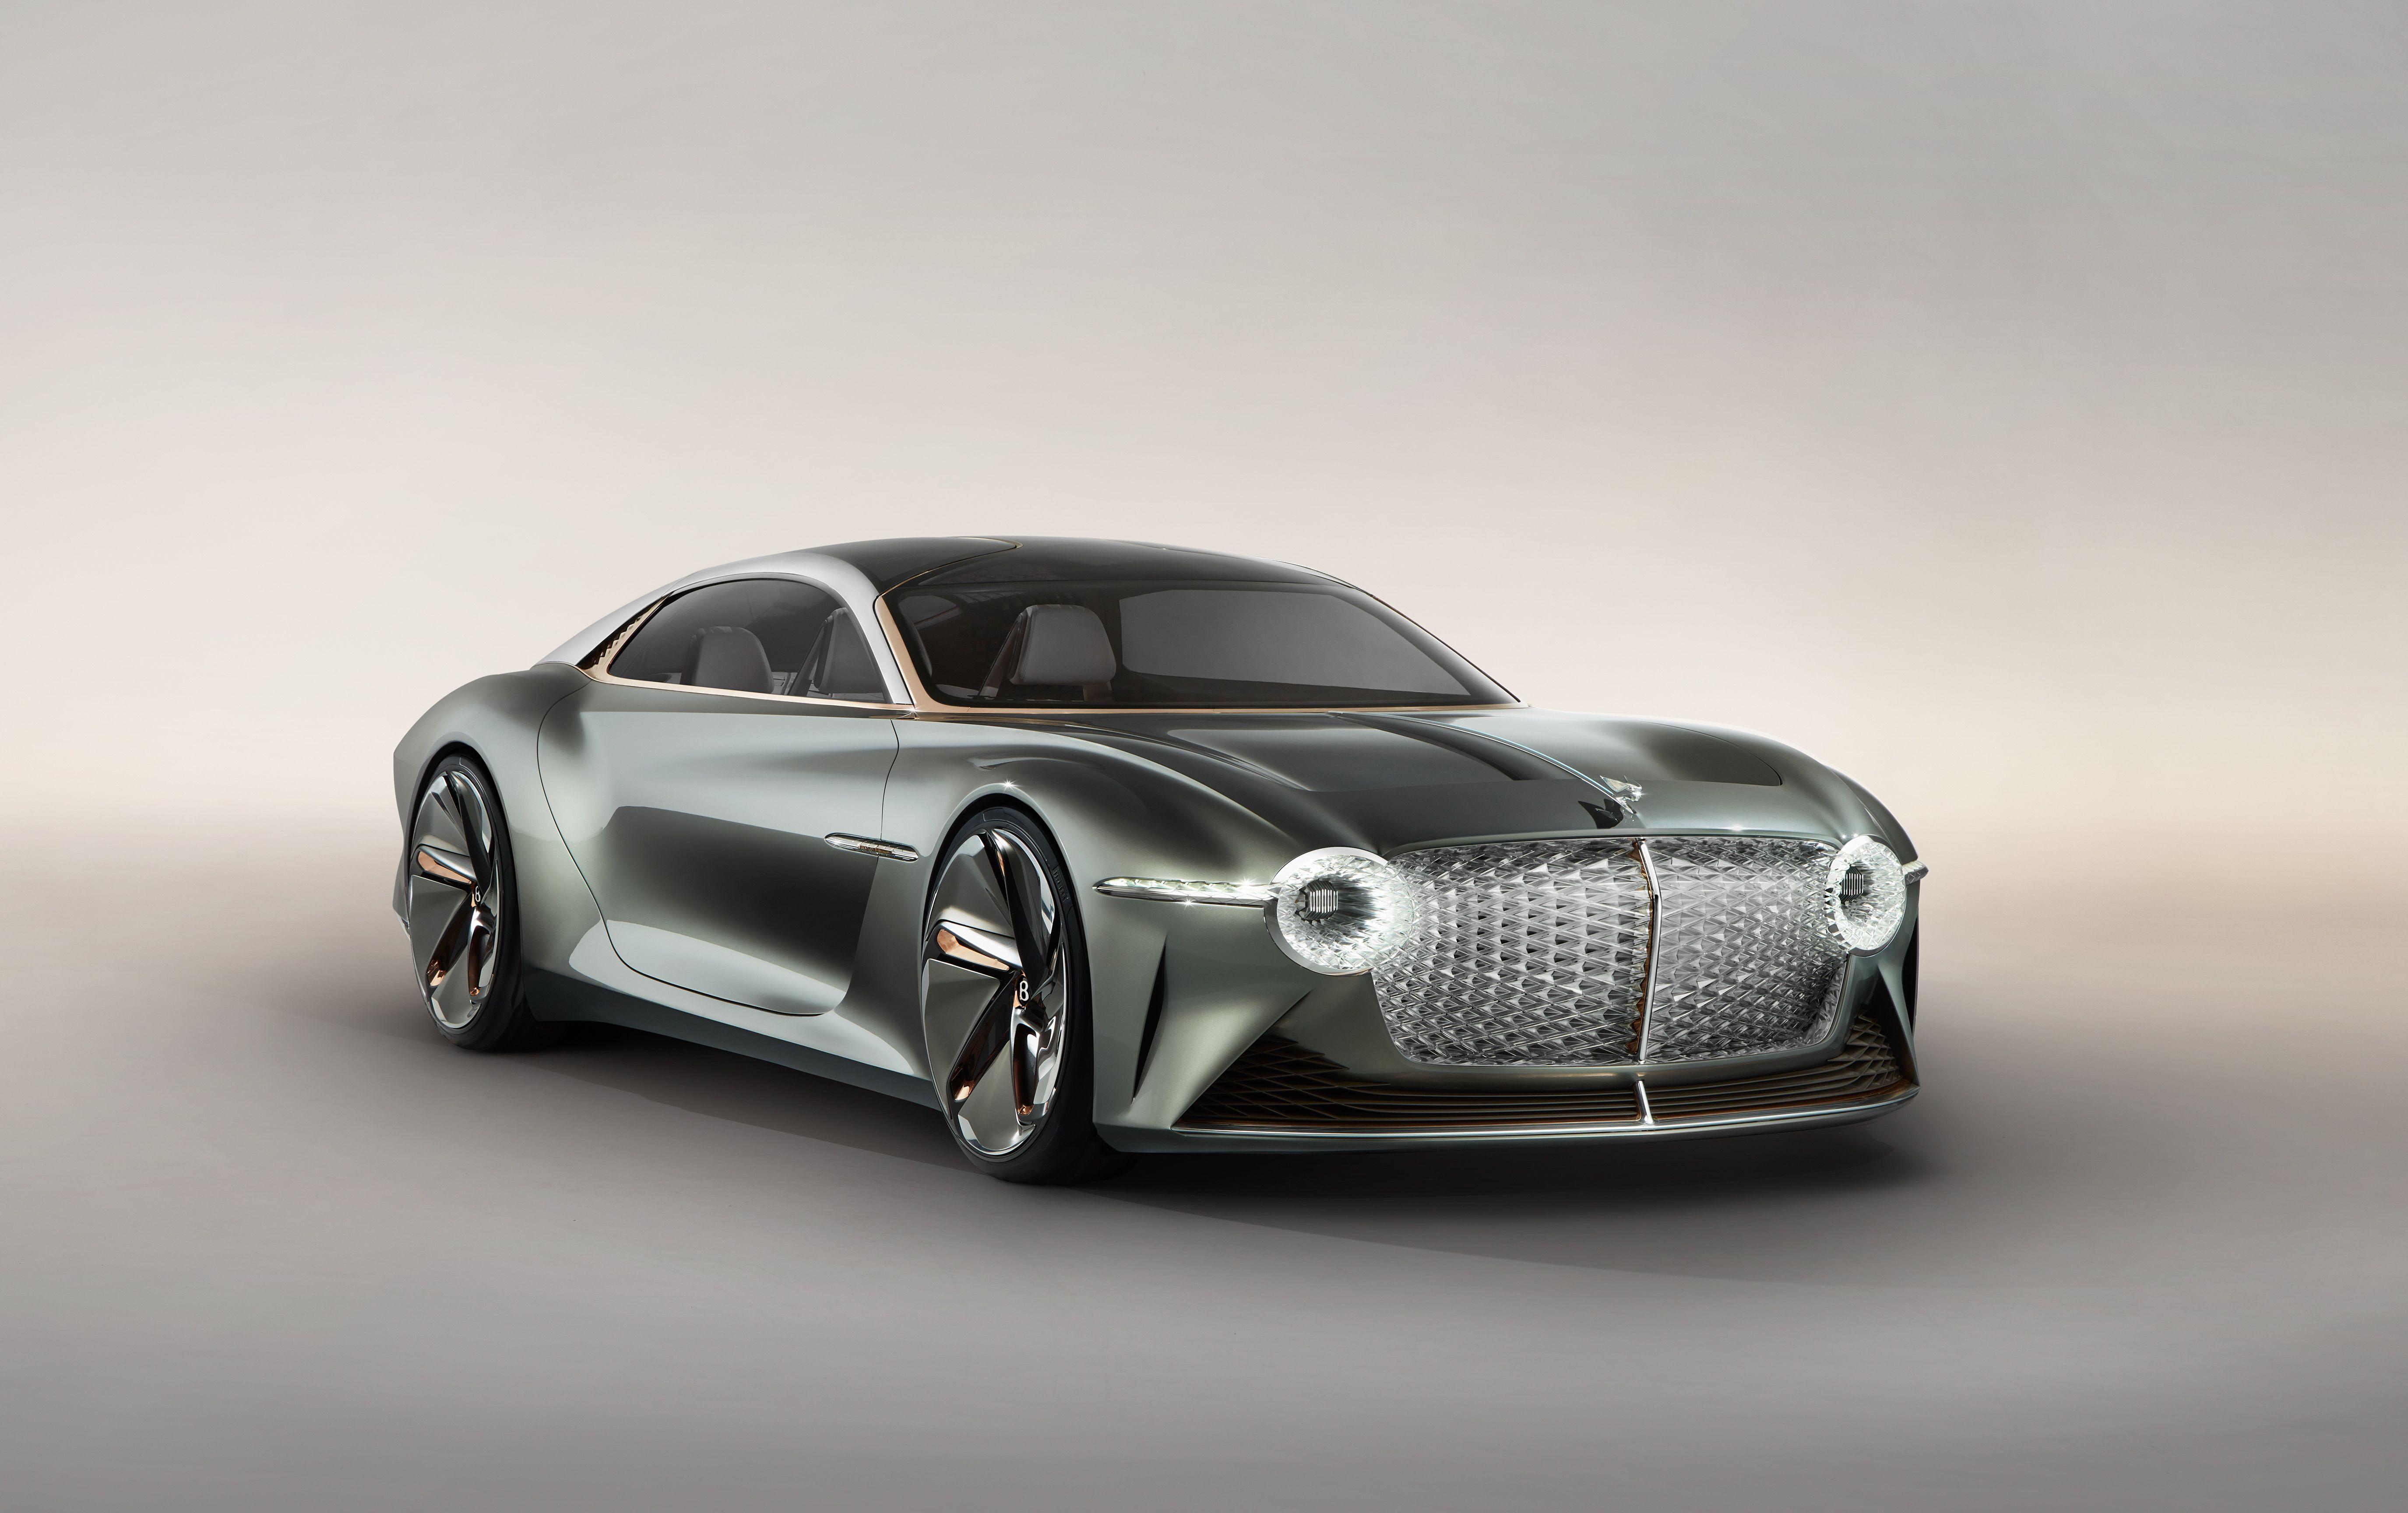 Bentley Exp 100 Gt Concept Car Luxury Electric Vehicle